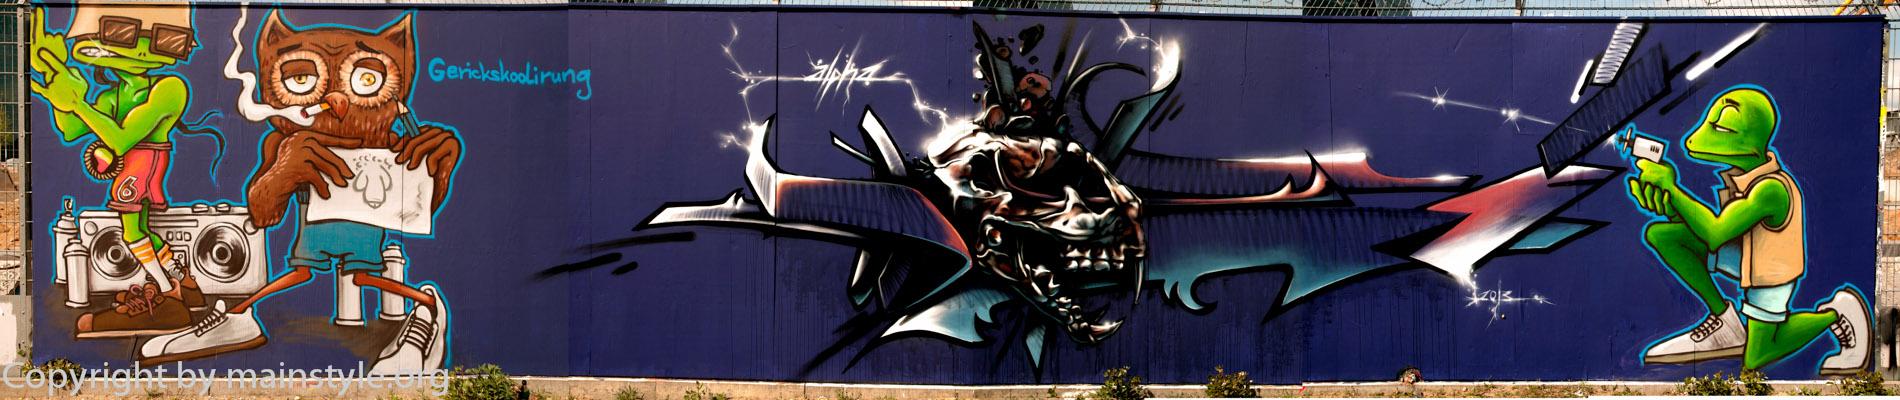 Frankfurt_Nacht_der_Museen_Graffiti_EZB_2013_Part3_full--7